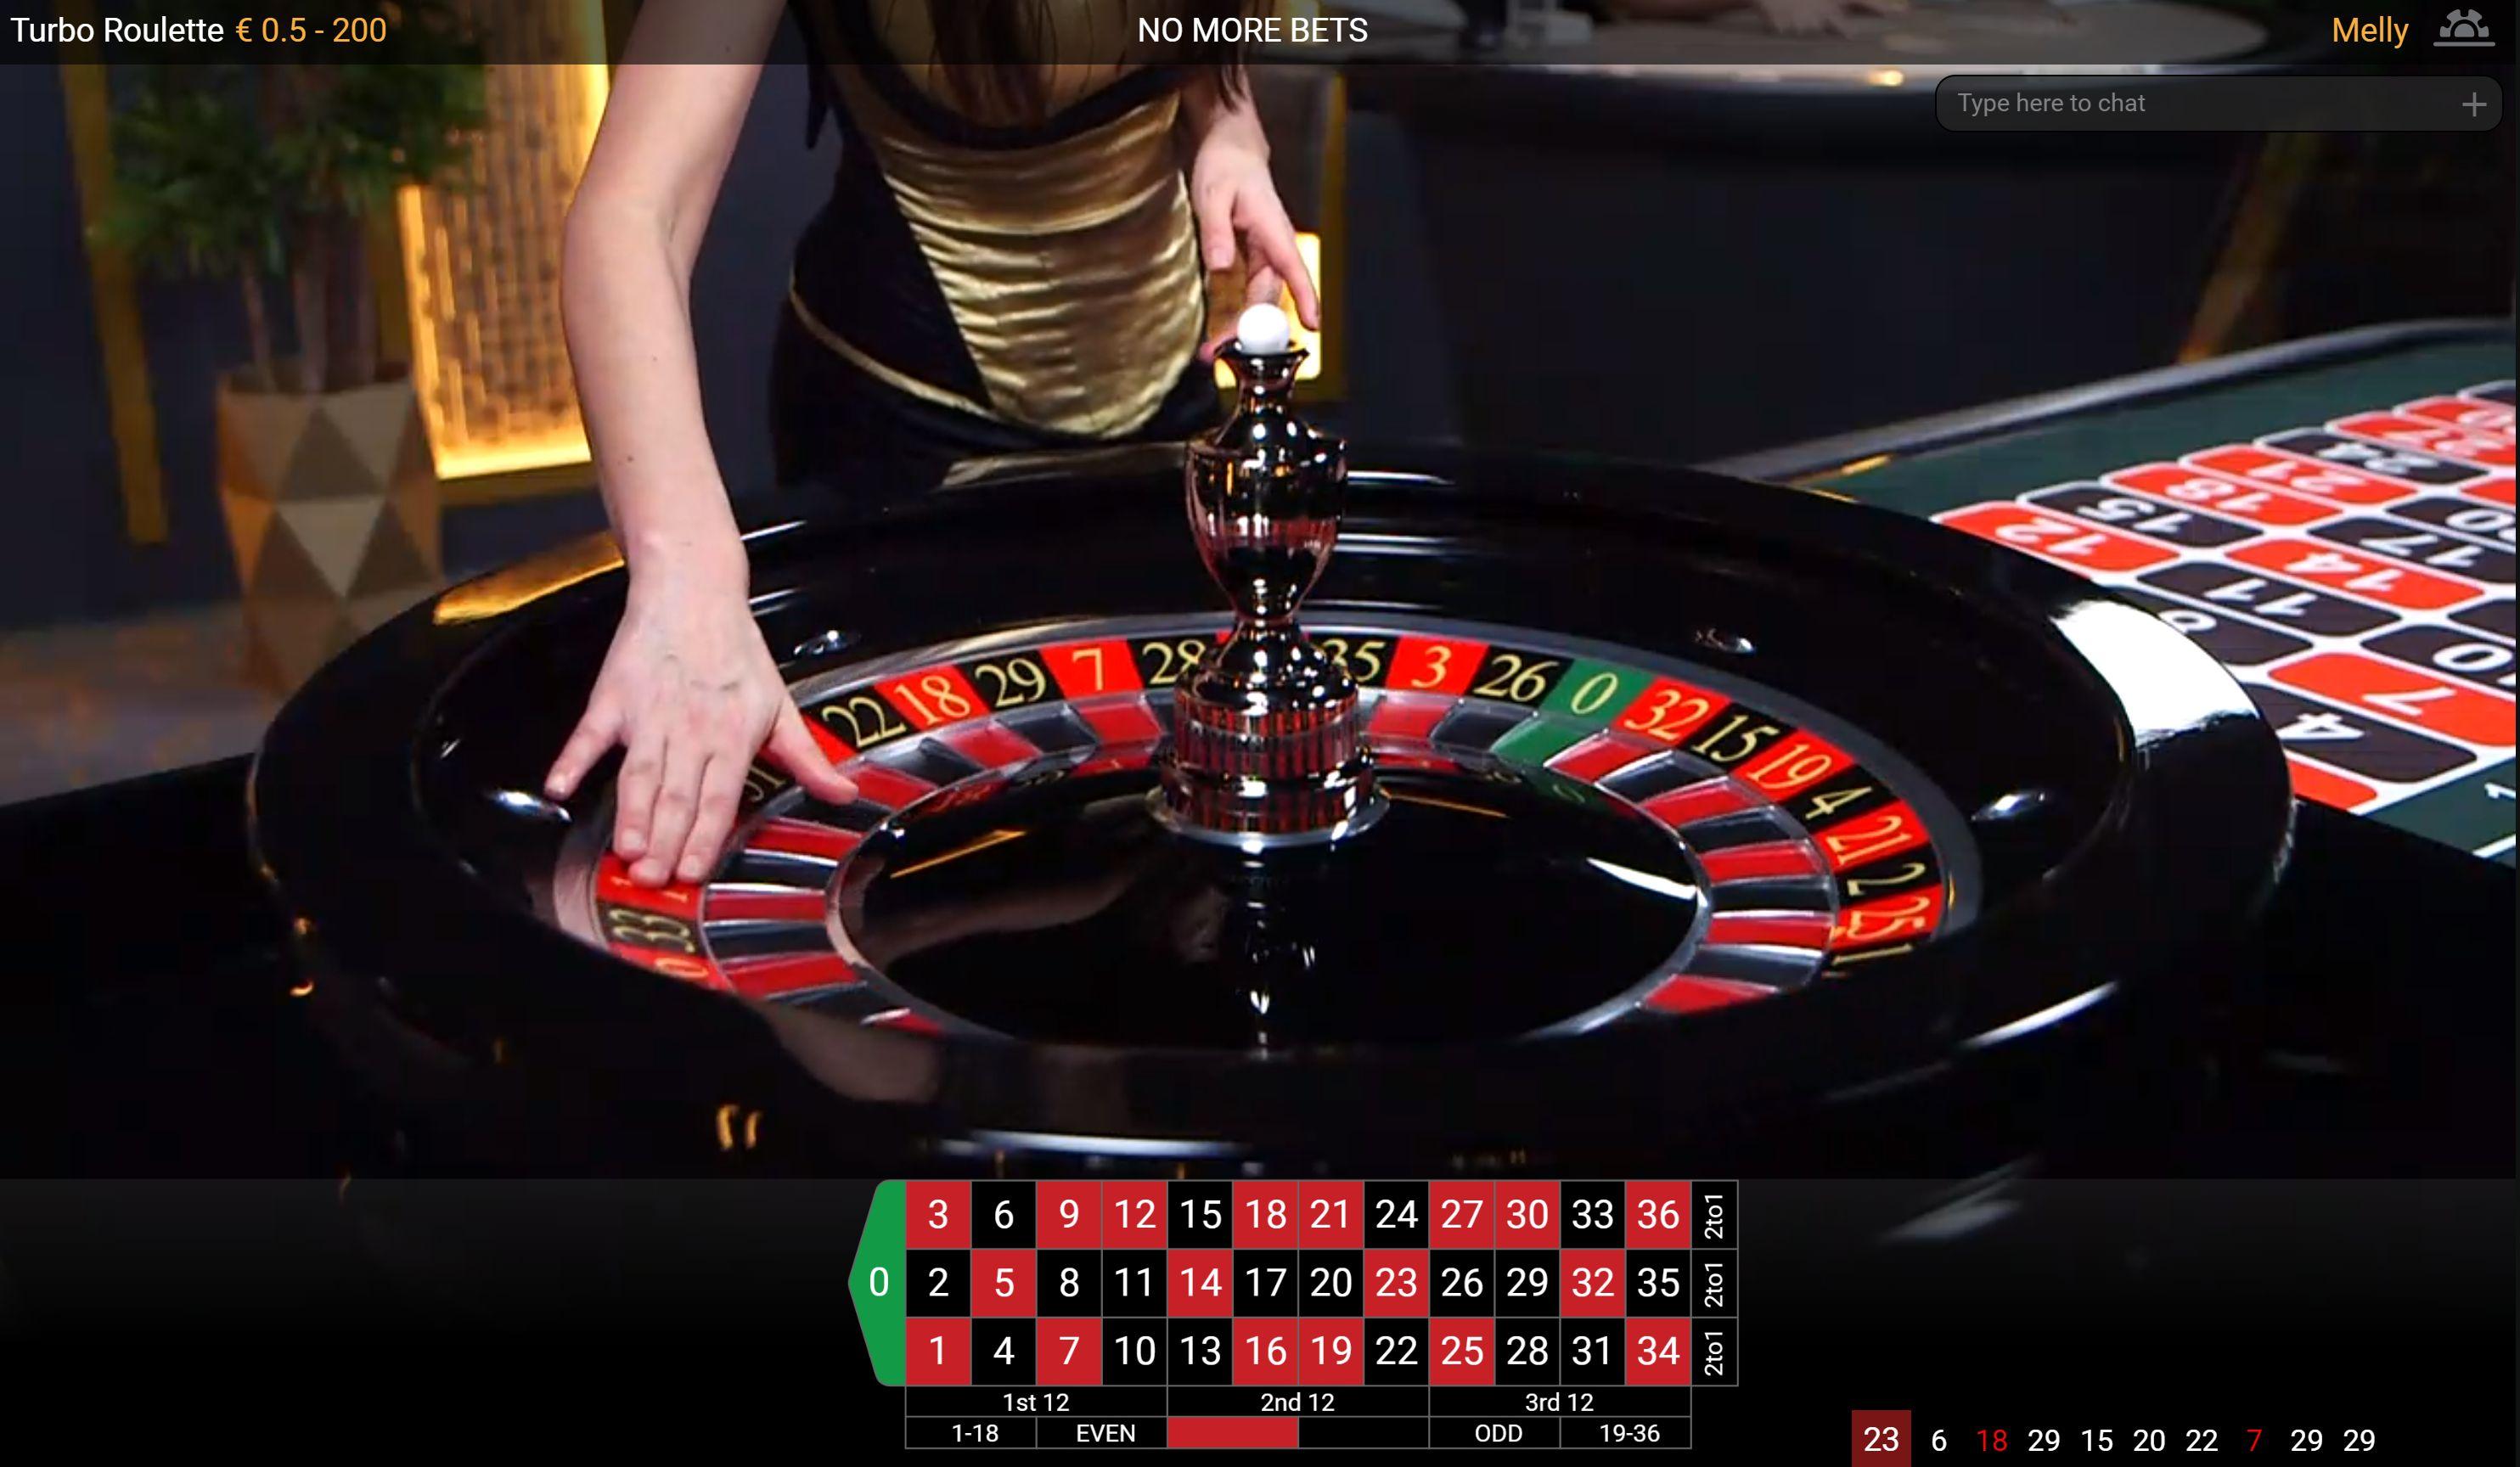 Live nettikasino Live Ruletti peli pelata mitä on paras online-kasino peli online todellista rahaa mobiili live casino holdem poker